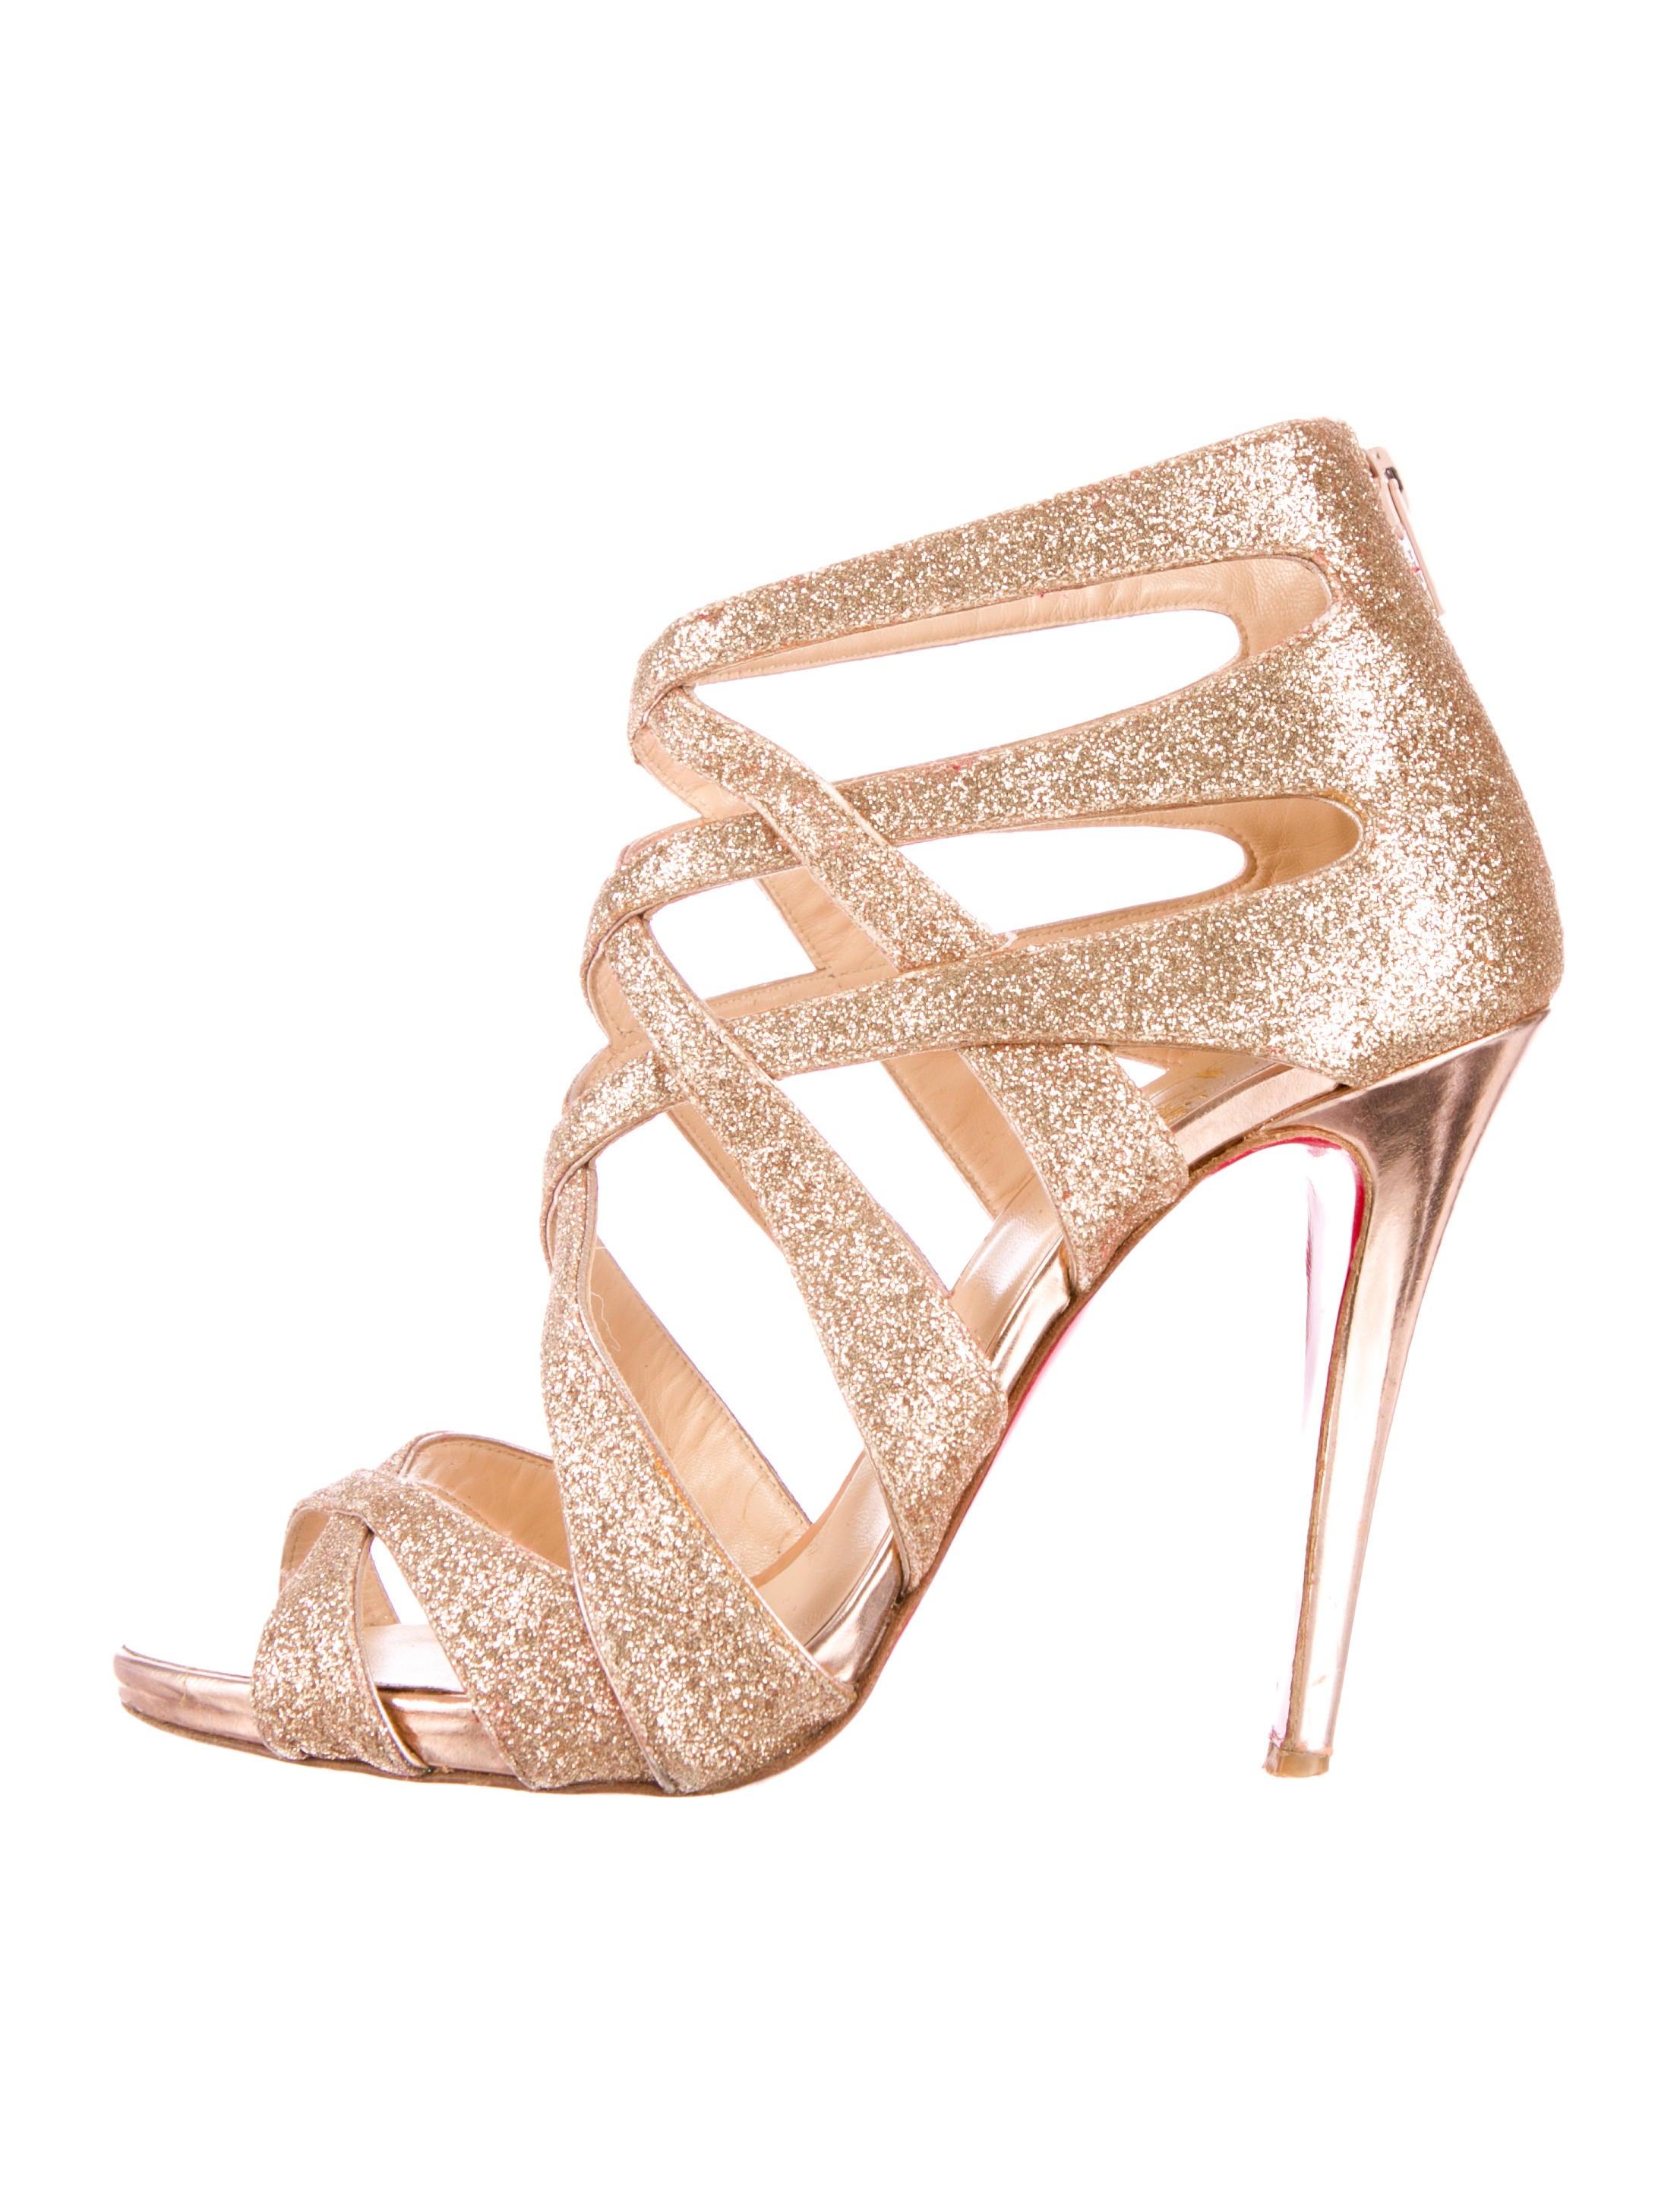 replica of christian louboutin shoes - christian louboutin Balota sandals Gold-tone glitter embellished ...